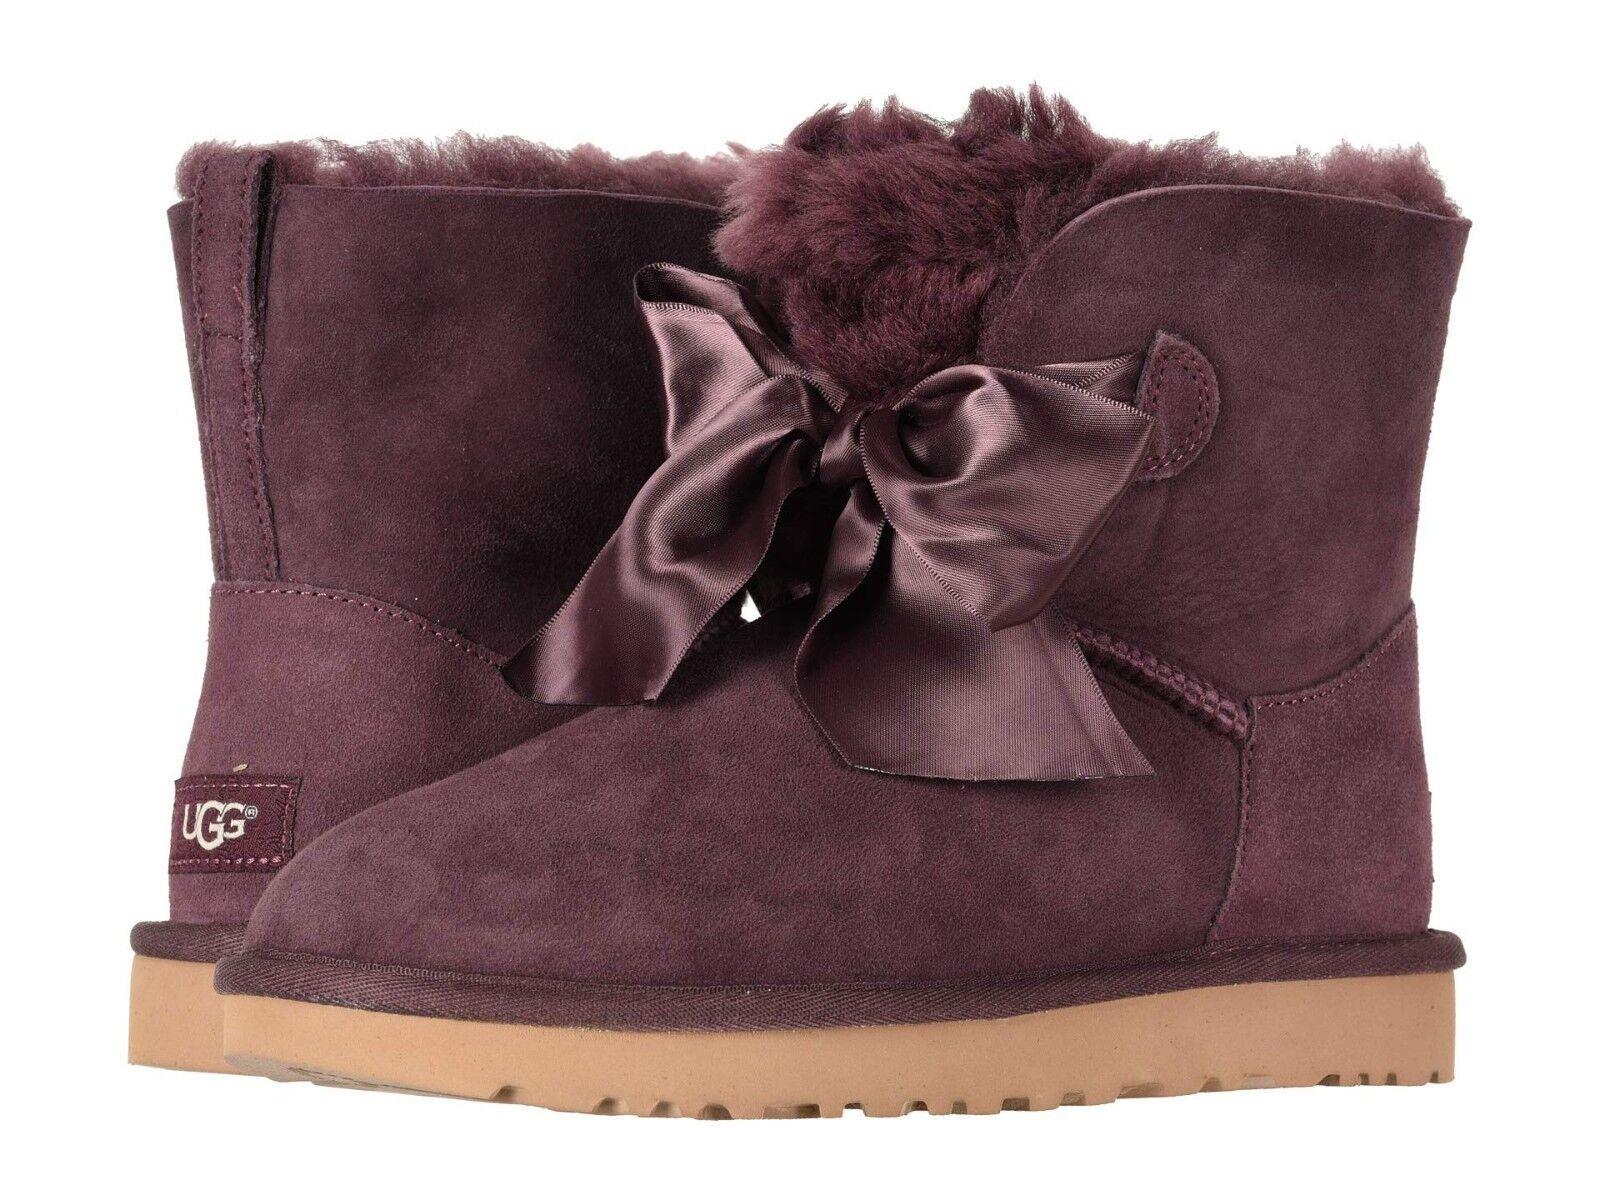 Női cipők UGG GITA Bow Mini Twinface csizma 1098360 PORT * Új *